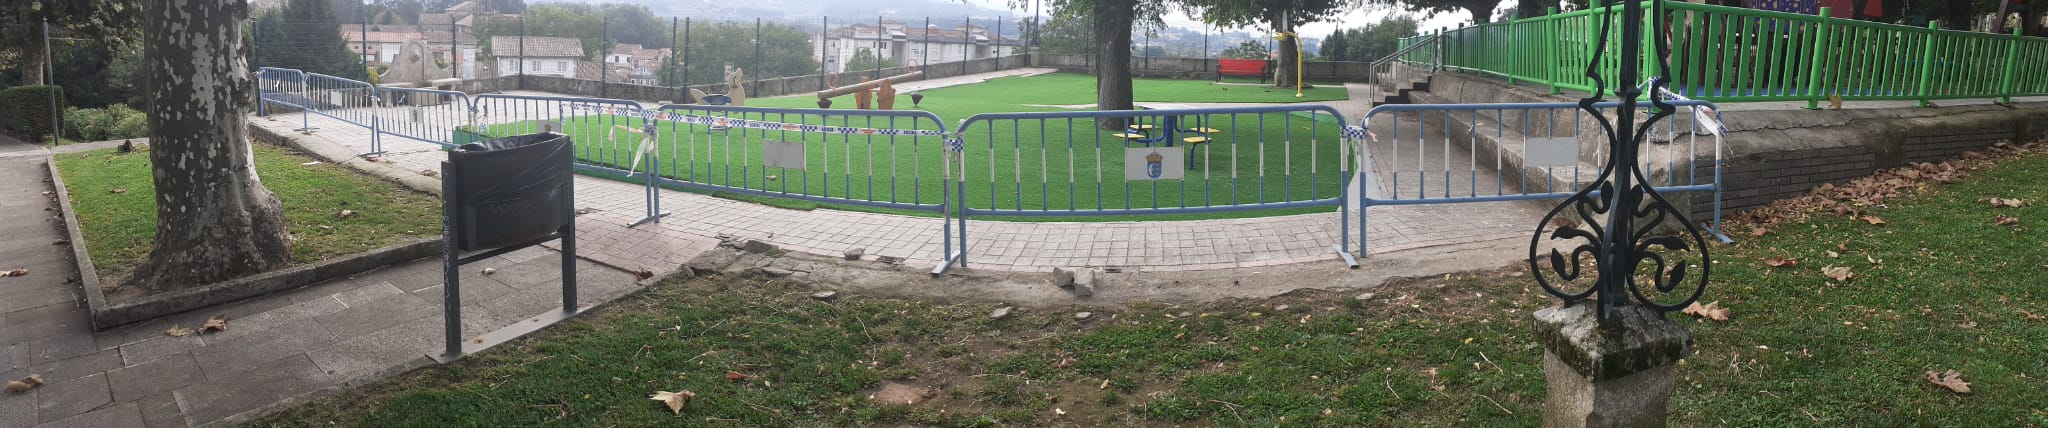 16092020 Parques Infantís - Precinto 2